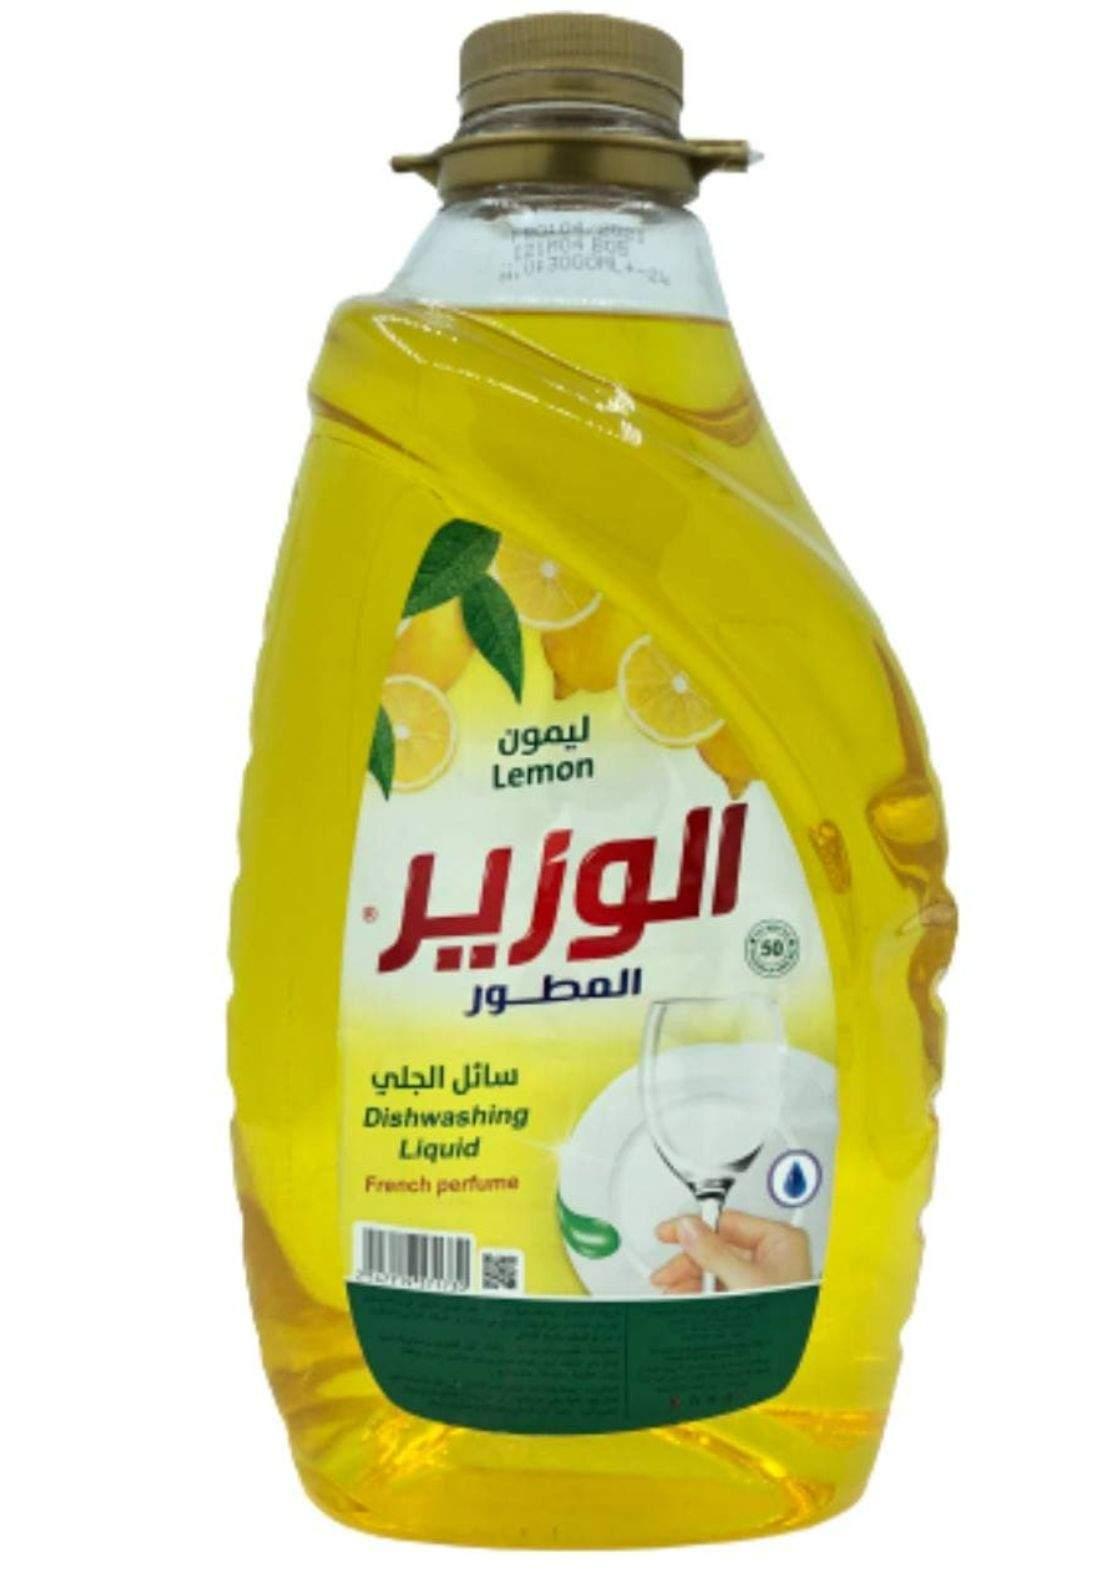 Al-wazir dishwashing liquid 3000mالوزير  سائل جل